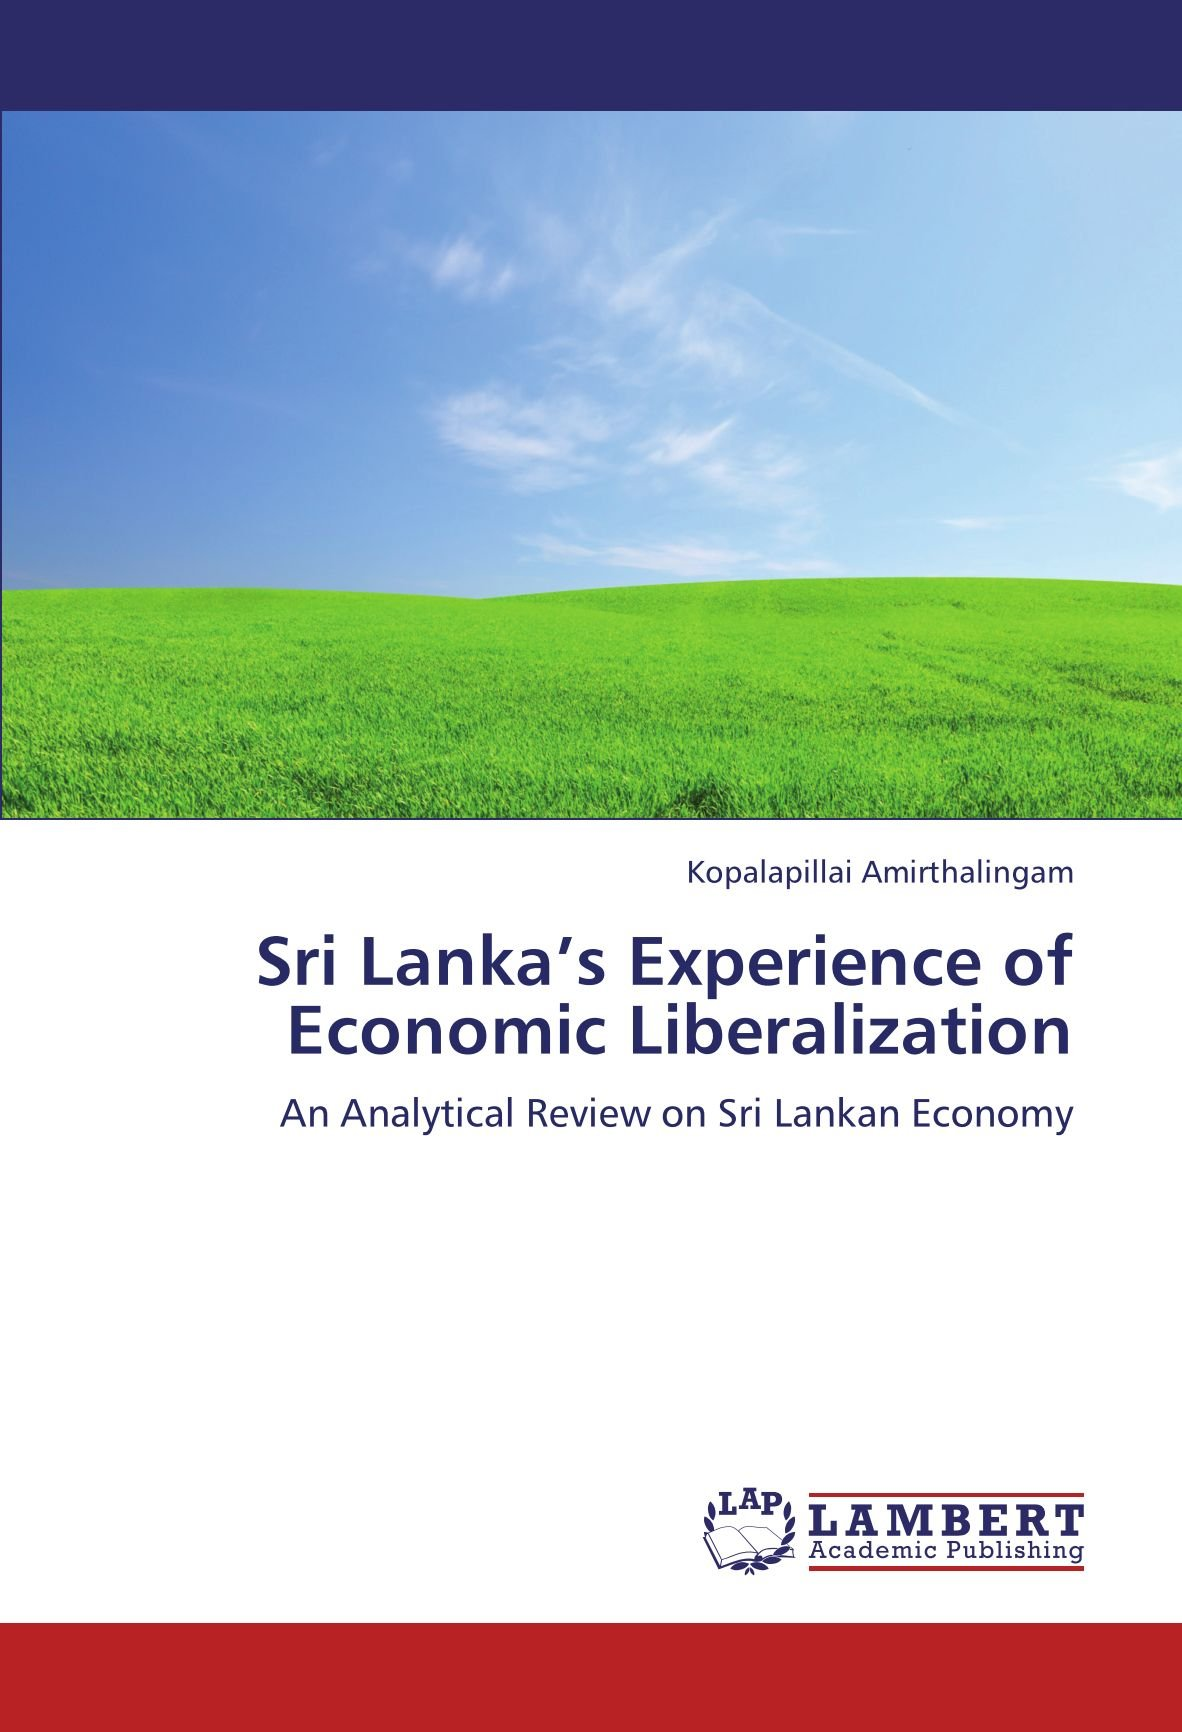 Sri Lanka's Experience of Economic Liberalization: An Analytical Review on Sri Lankan Economy ebook